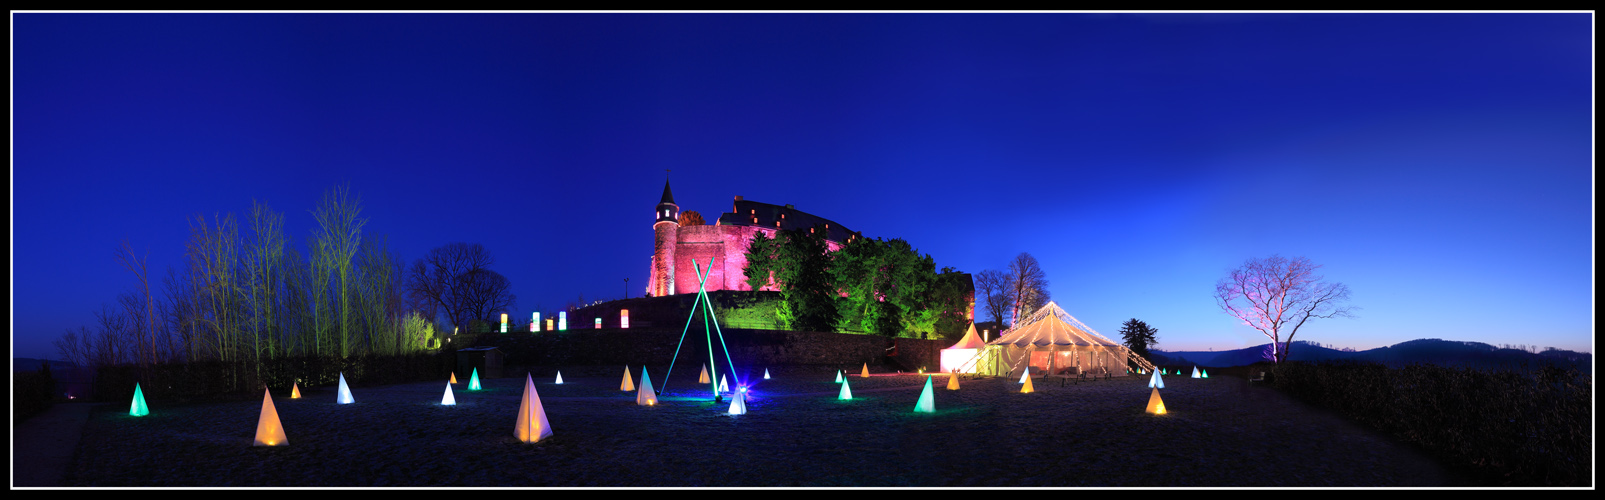 Lichterspiele am Schloss Hohenlimburg